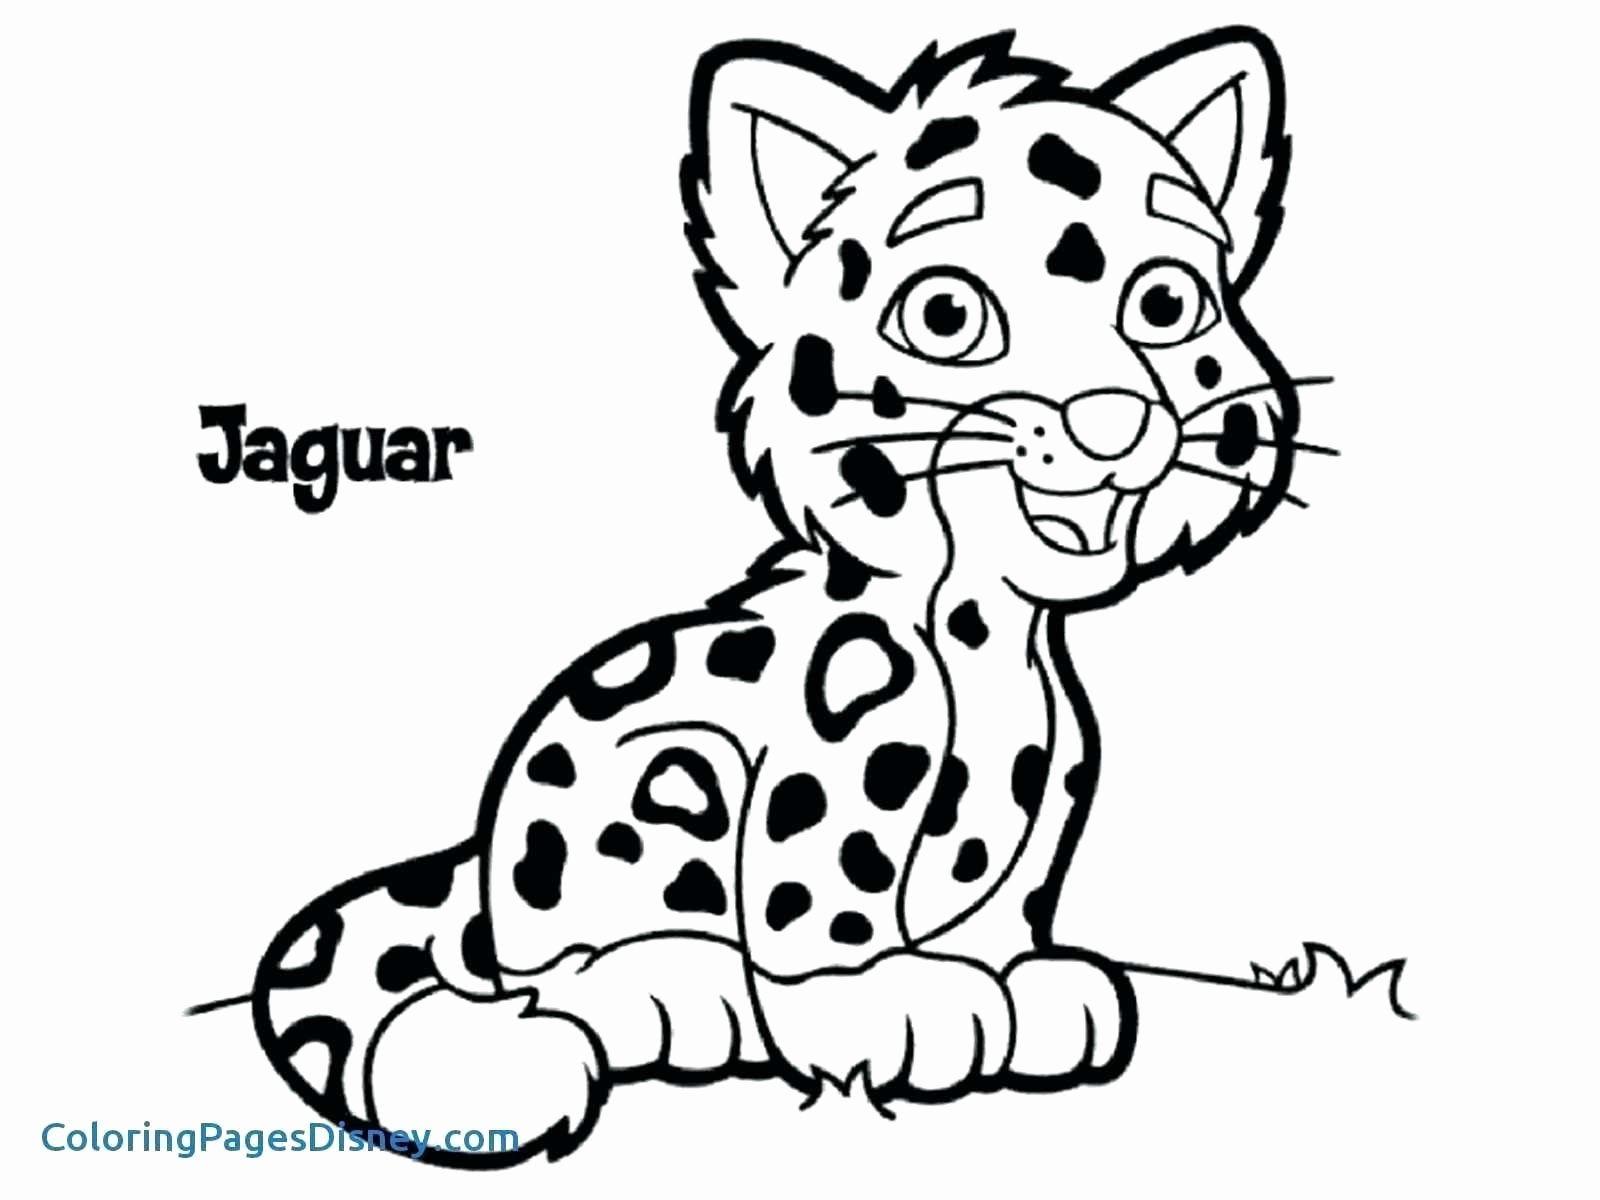 Cute Cartoon Animal Coloring Pages Elegant Cheetah Coloring Pages For Adults Navajosheet